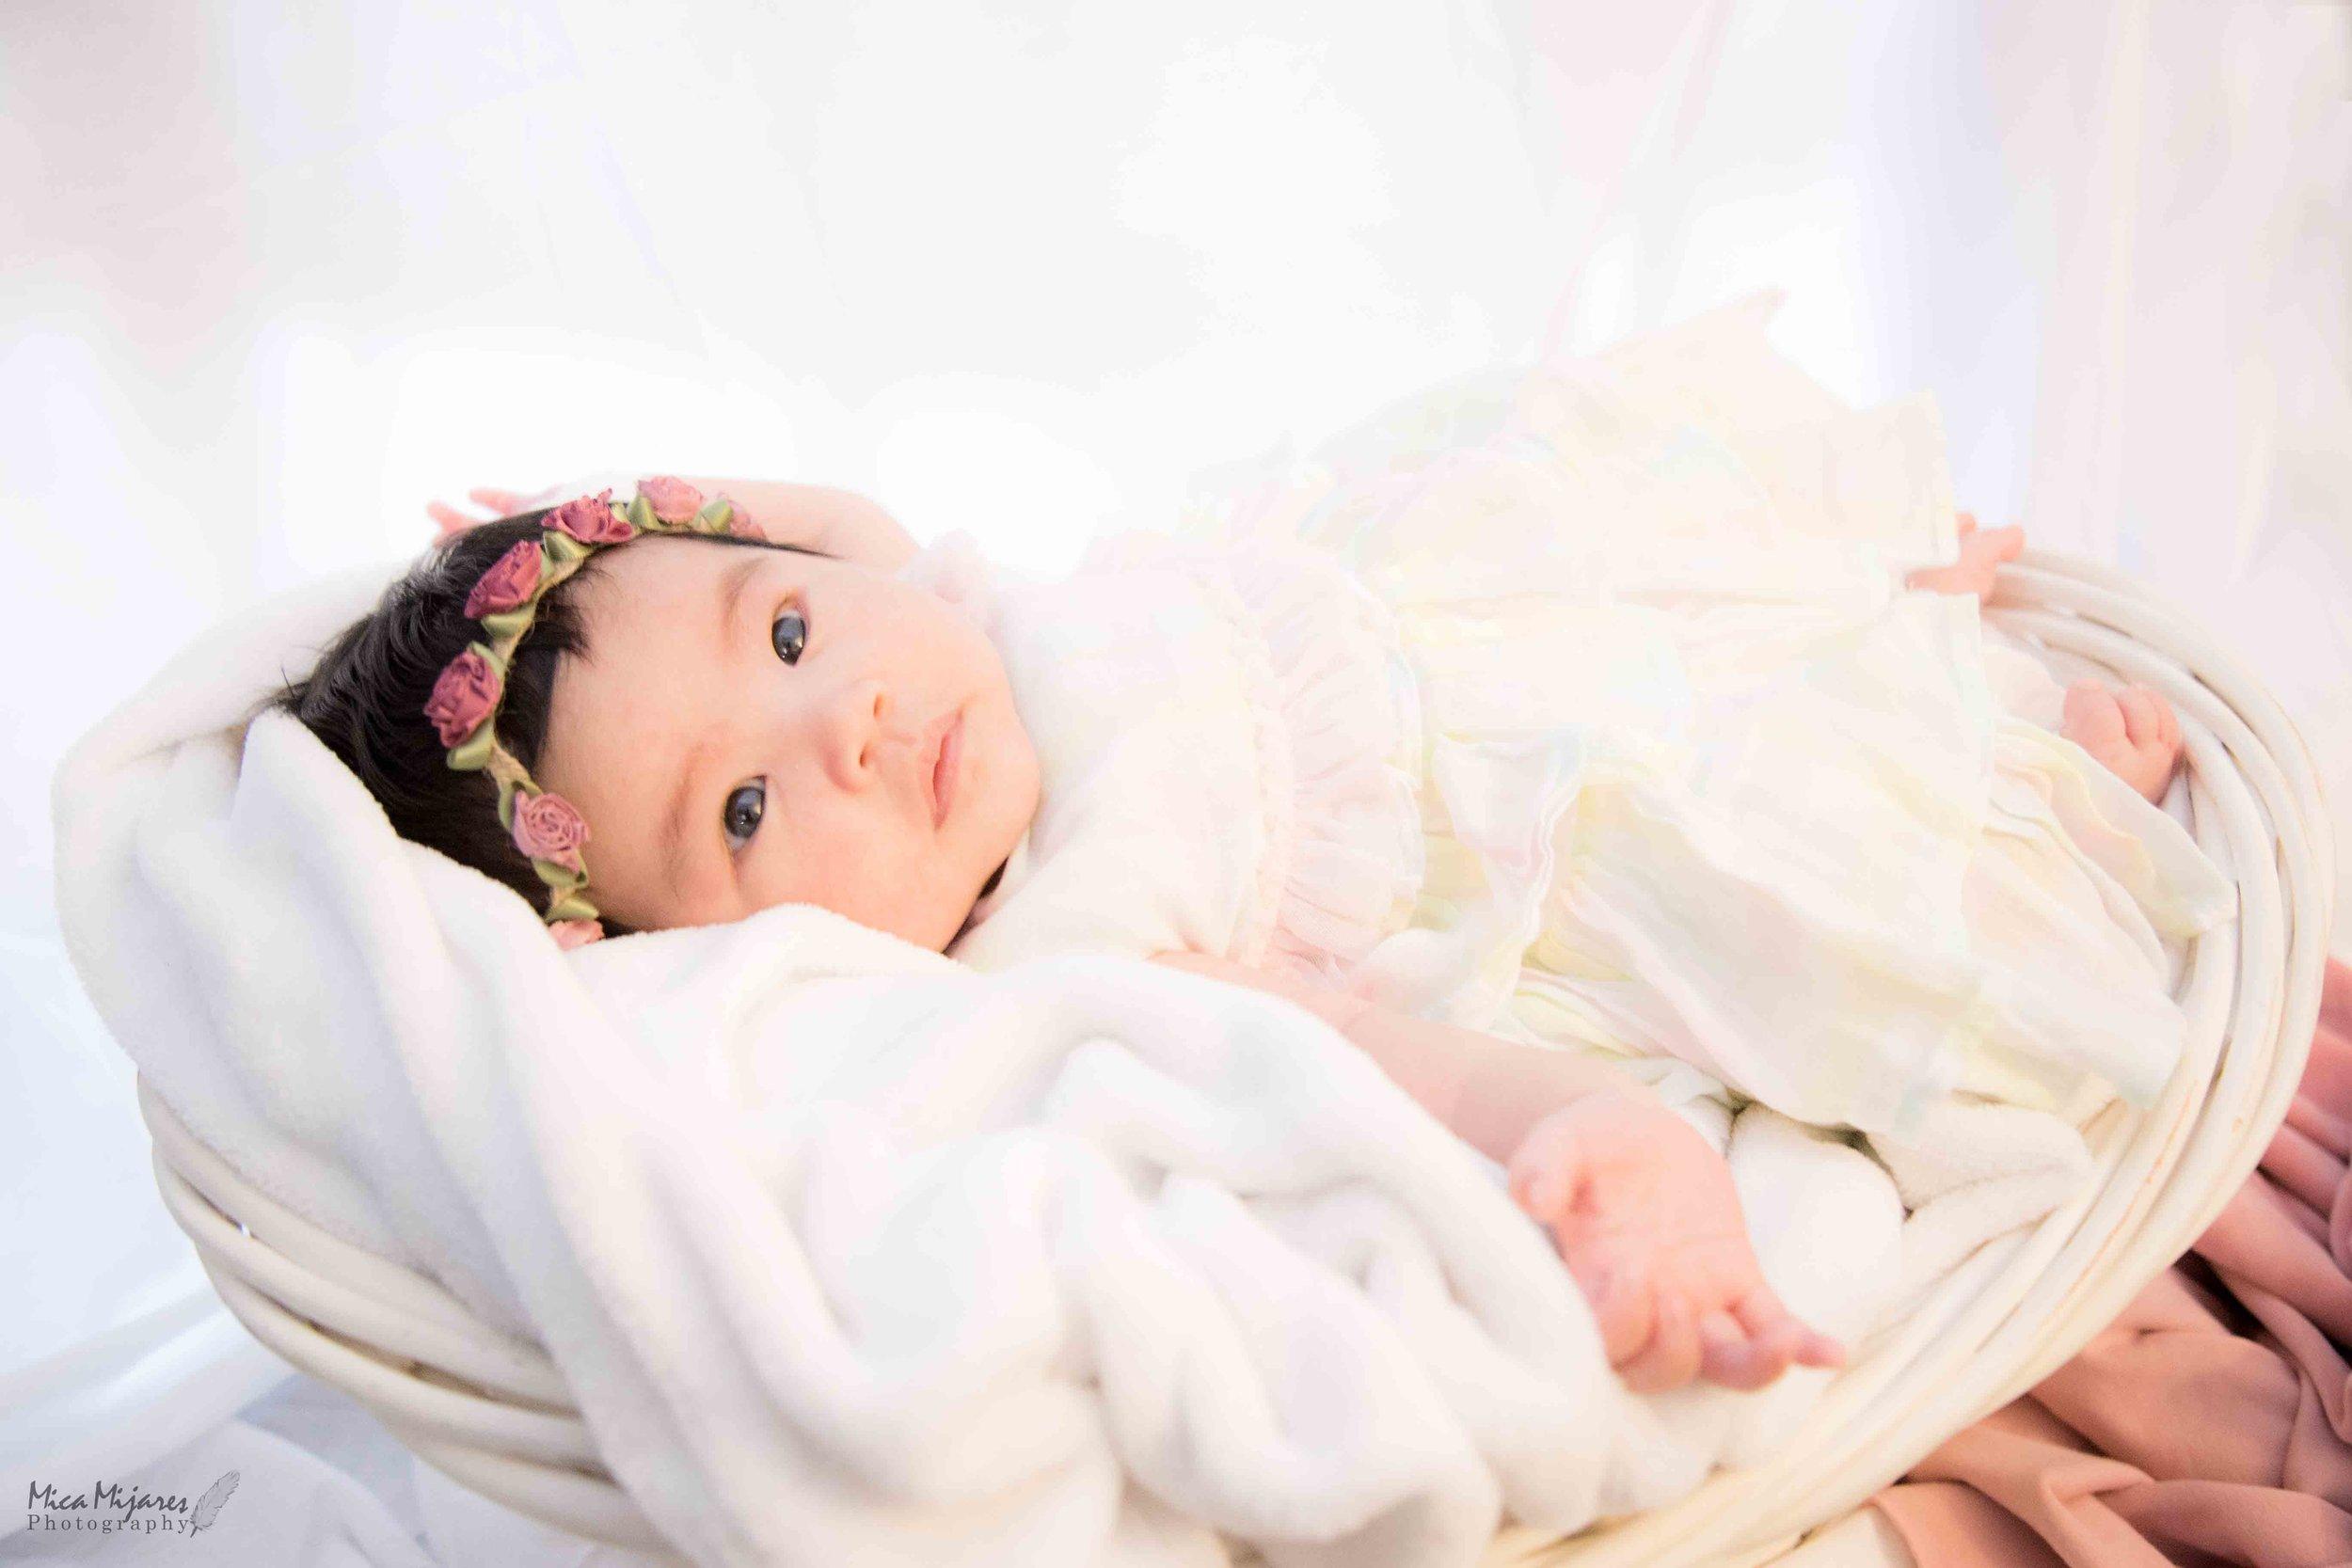 rileyfaith-BabyPhotography-MicaMijaresPhotography (16 of 27).jpg